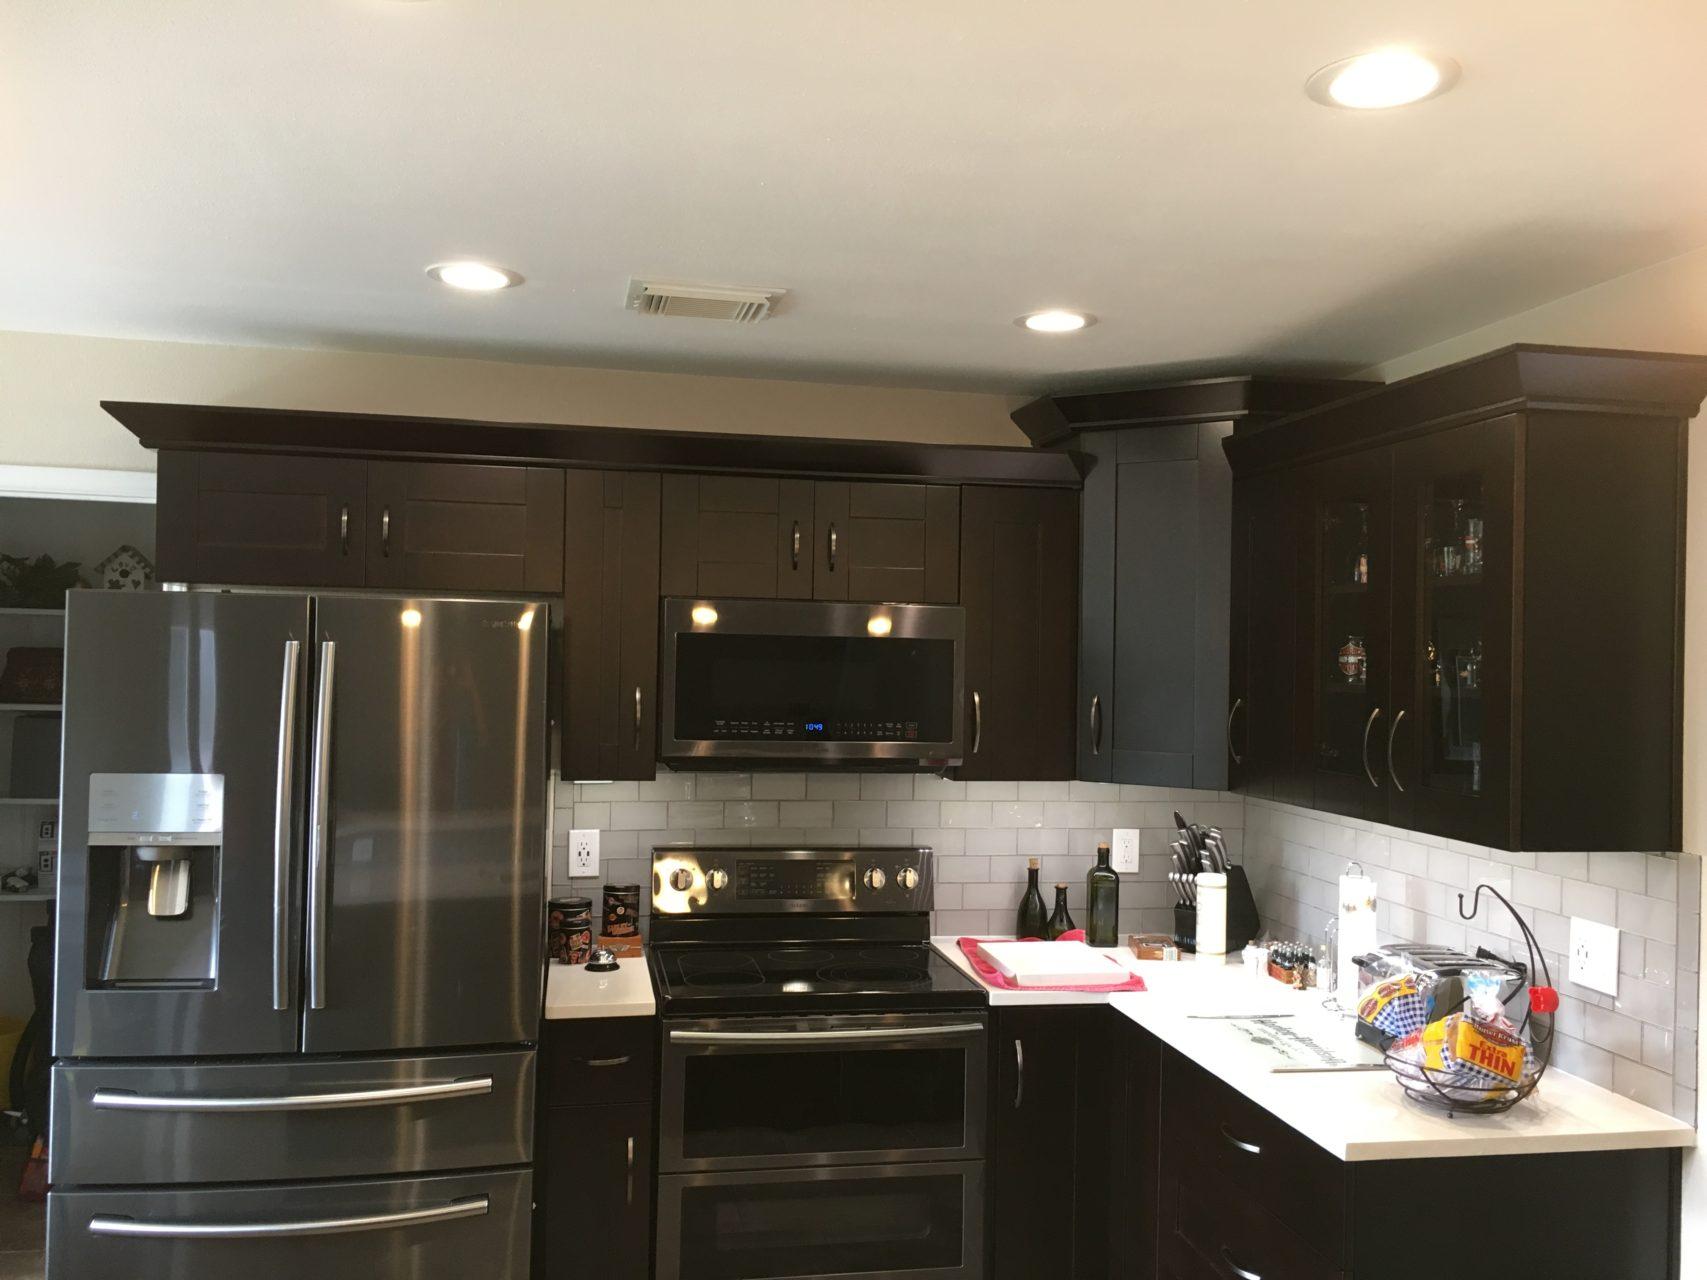 San Antonio kitchen remodeling contractors Alamo Heights kitchen remodeling kitchen and bath kitchen cabinets kitchen countertops new kitchen contractors remodelers renovation company